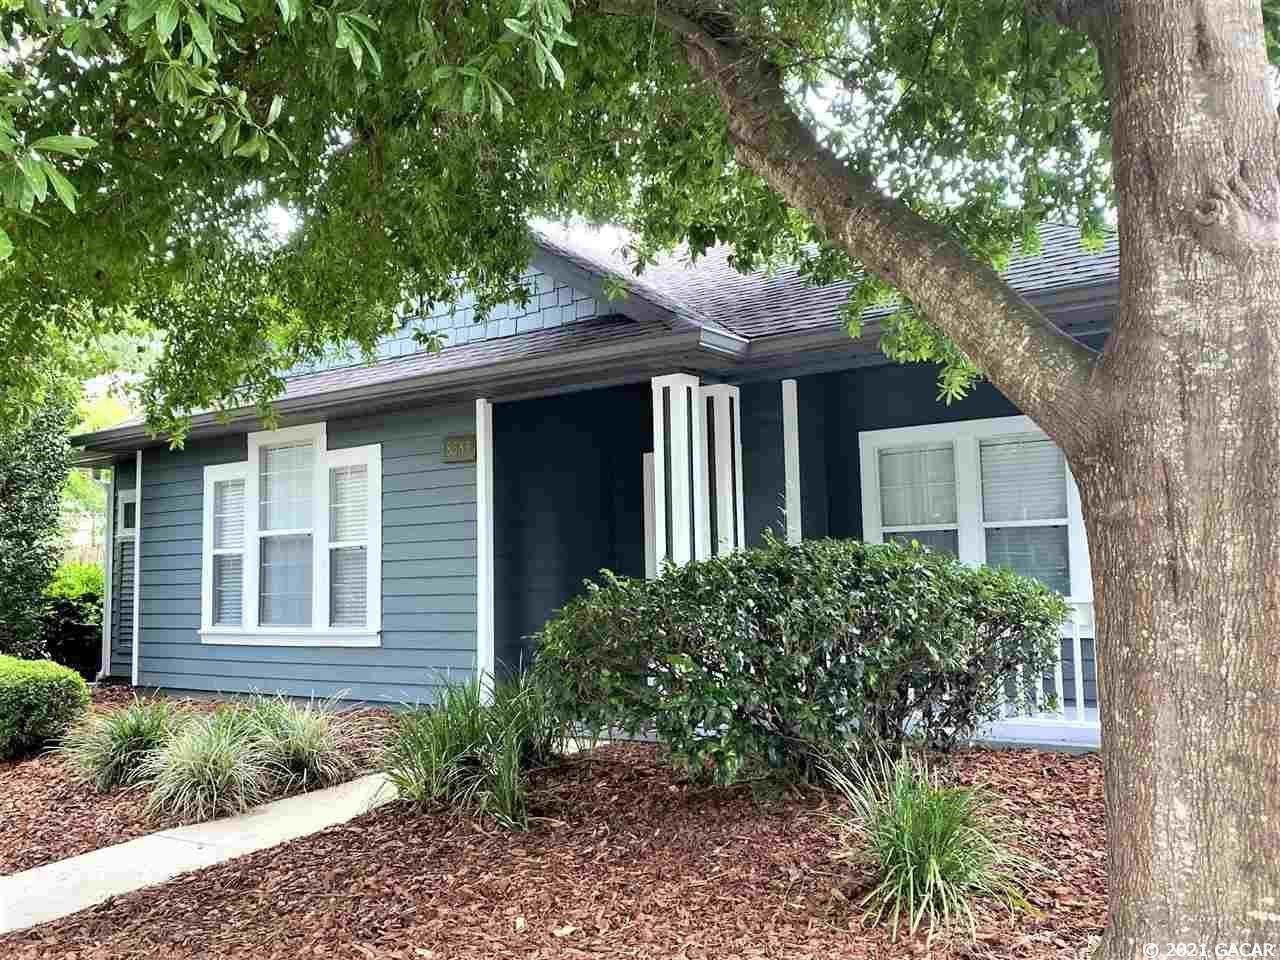 8585 SW 76 Place, Gainesville, FL 32608 - #: 443713